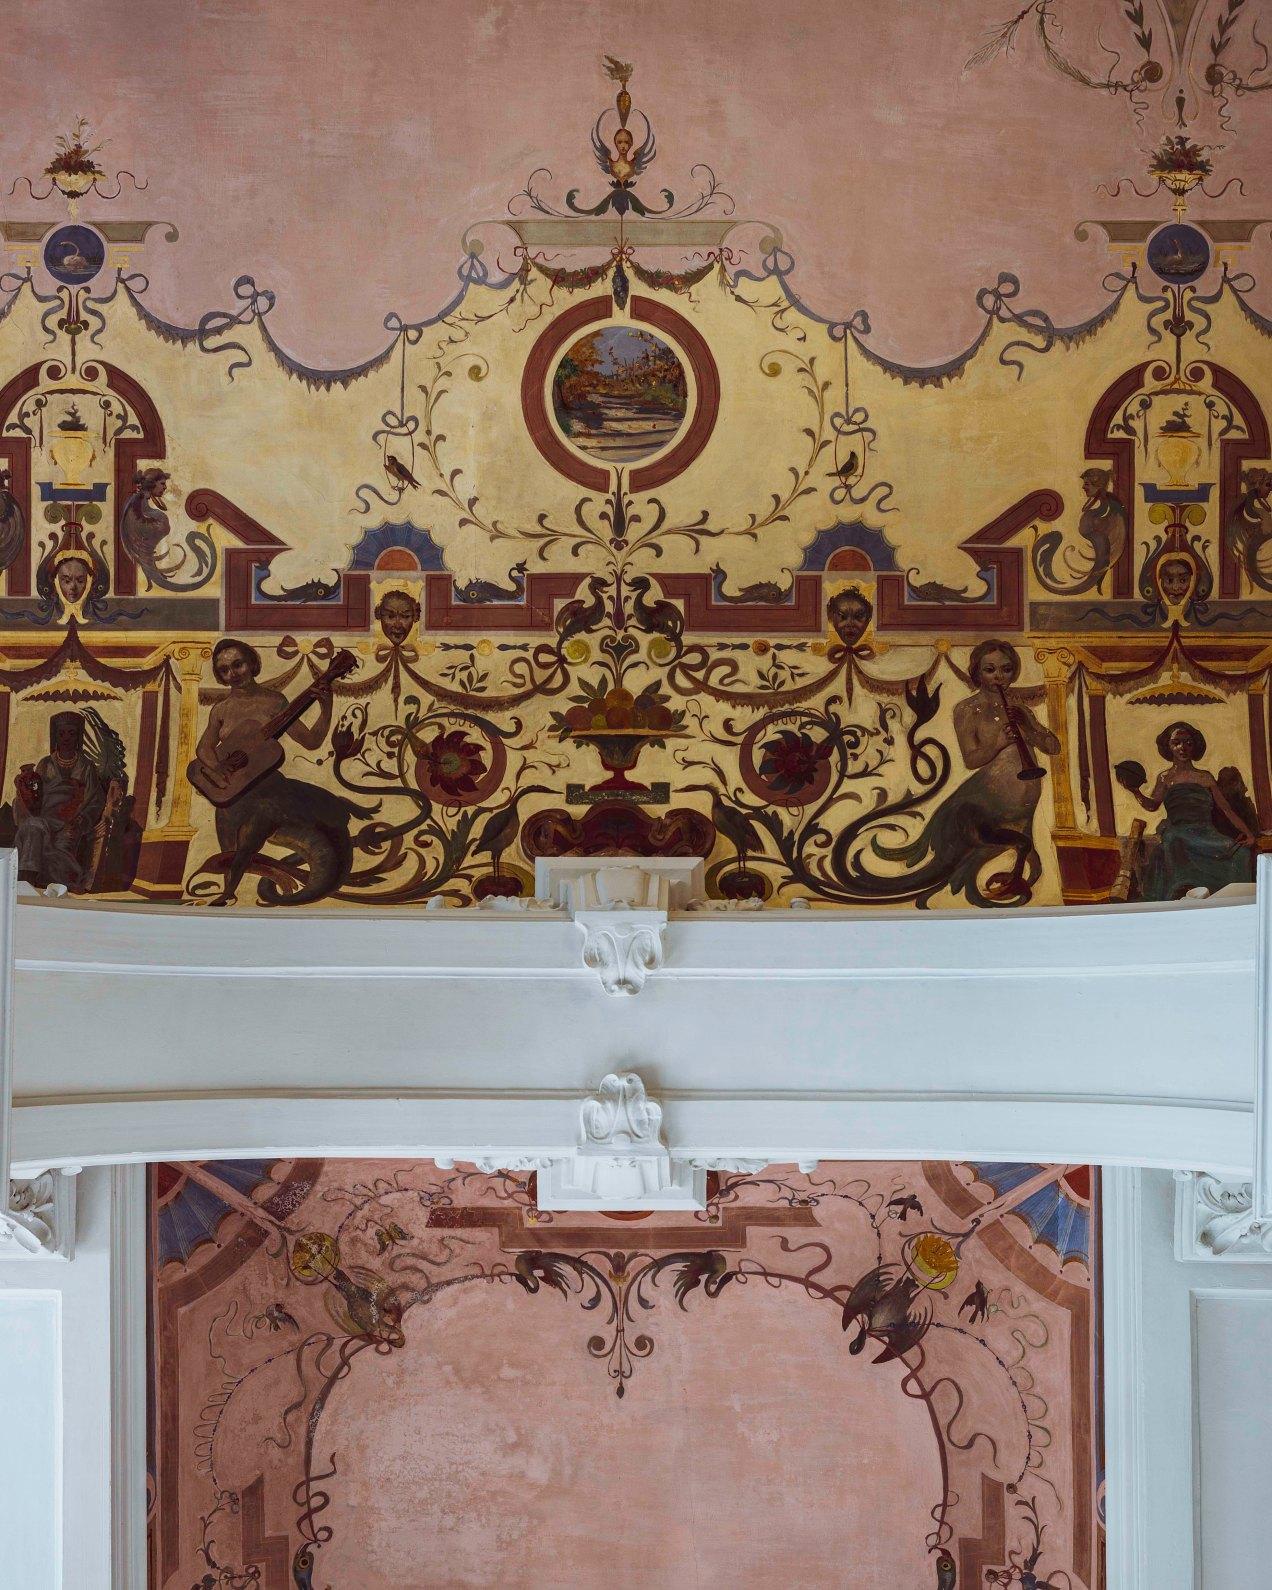 Les plafonds du Westminster, Nice, gildalliere, 2019